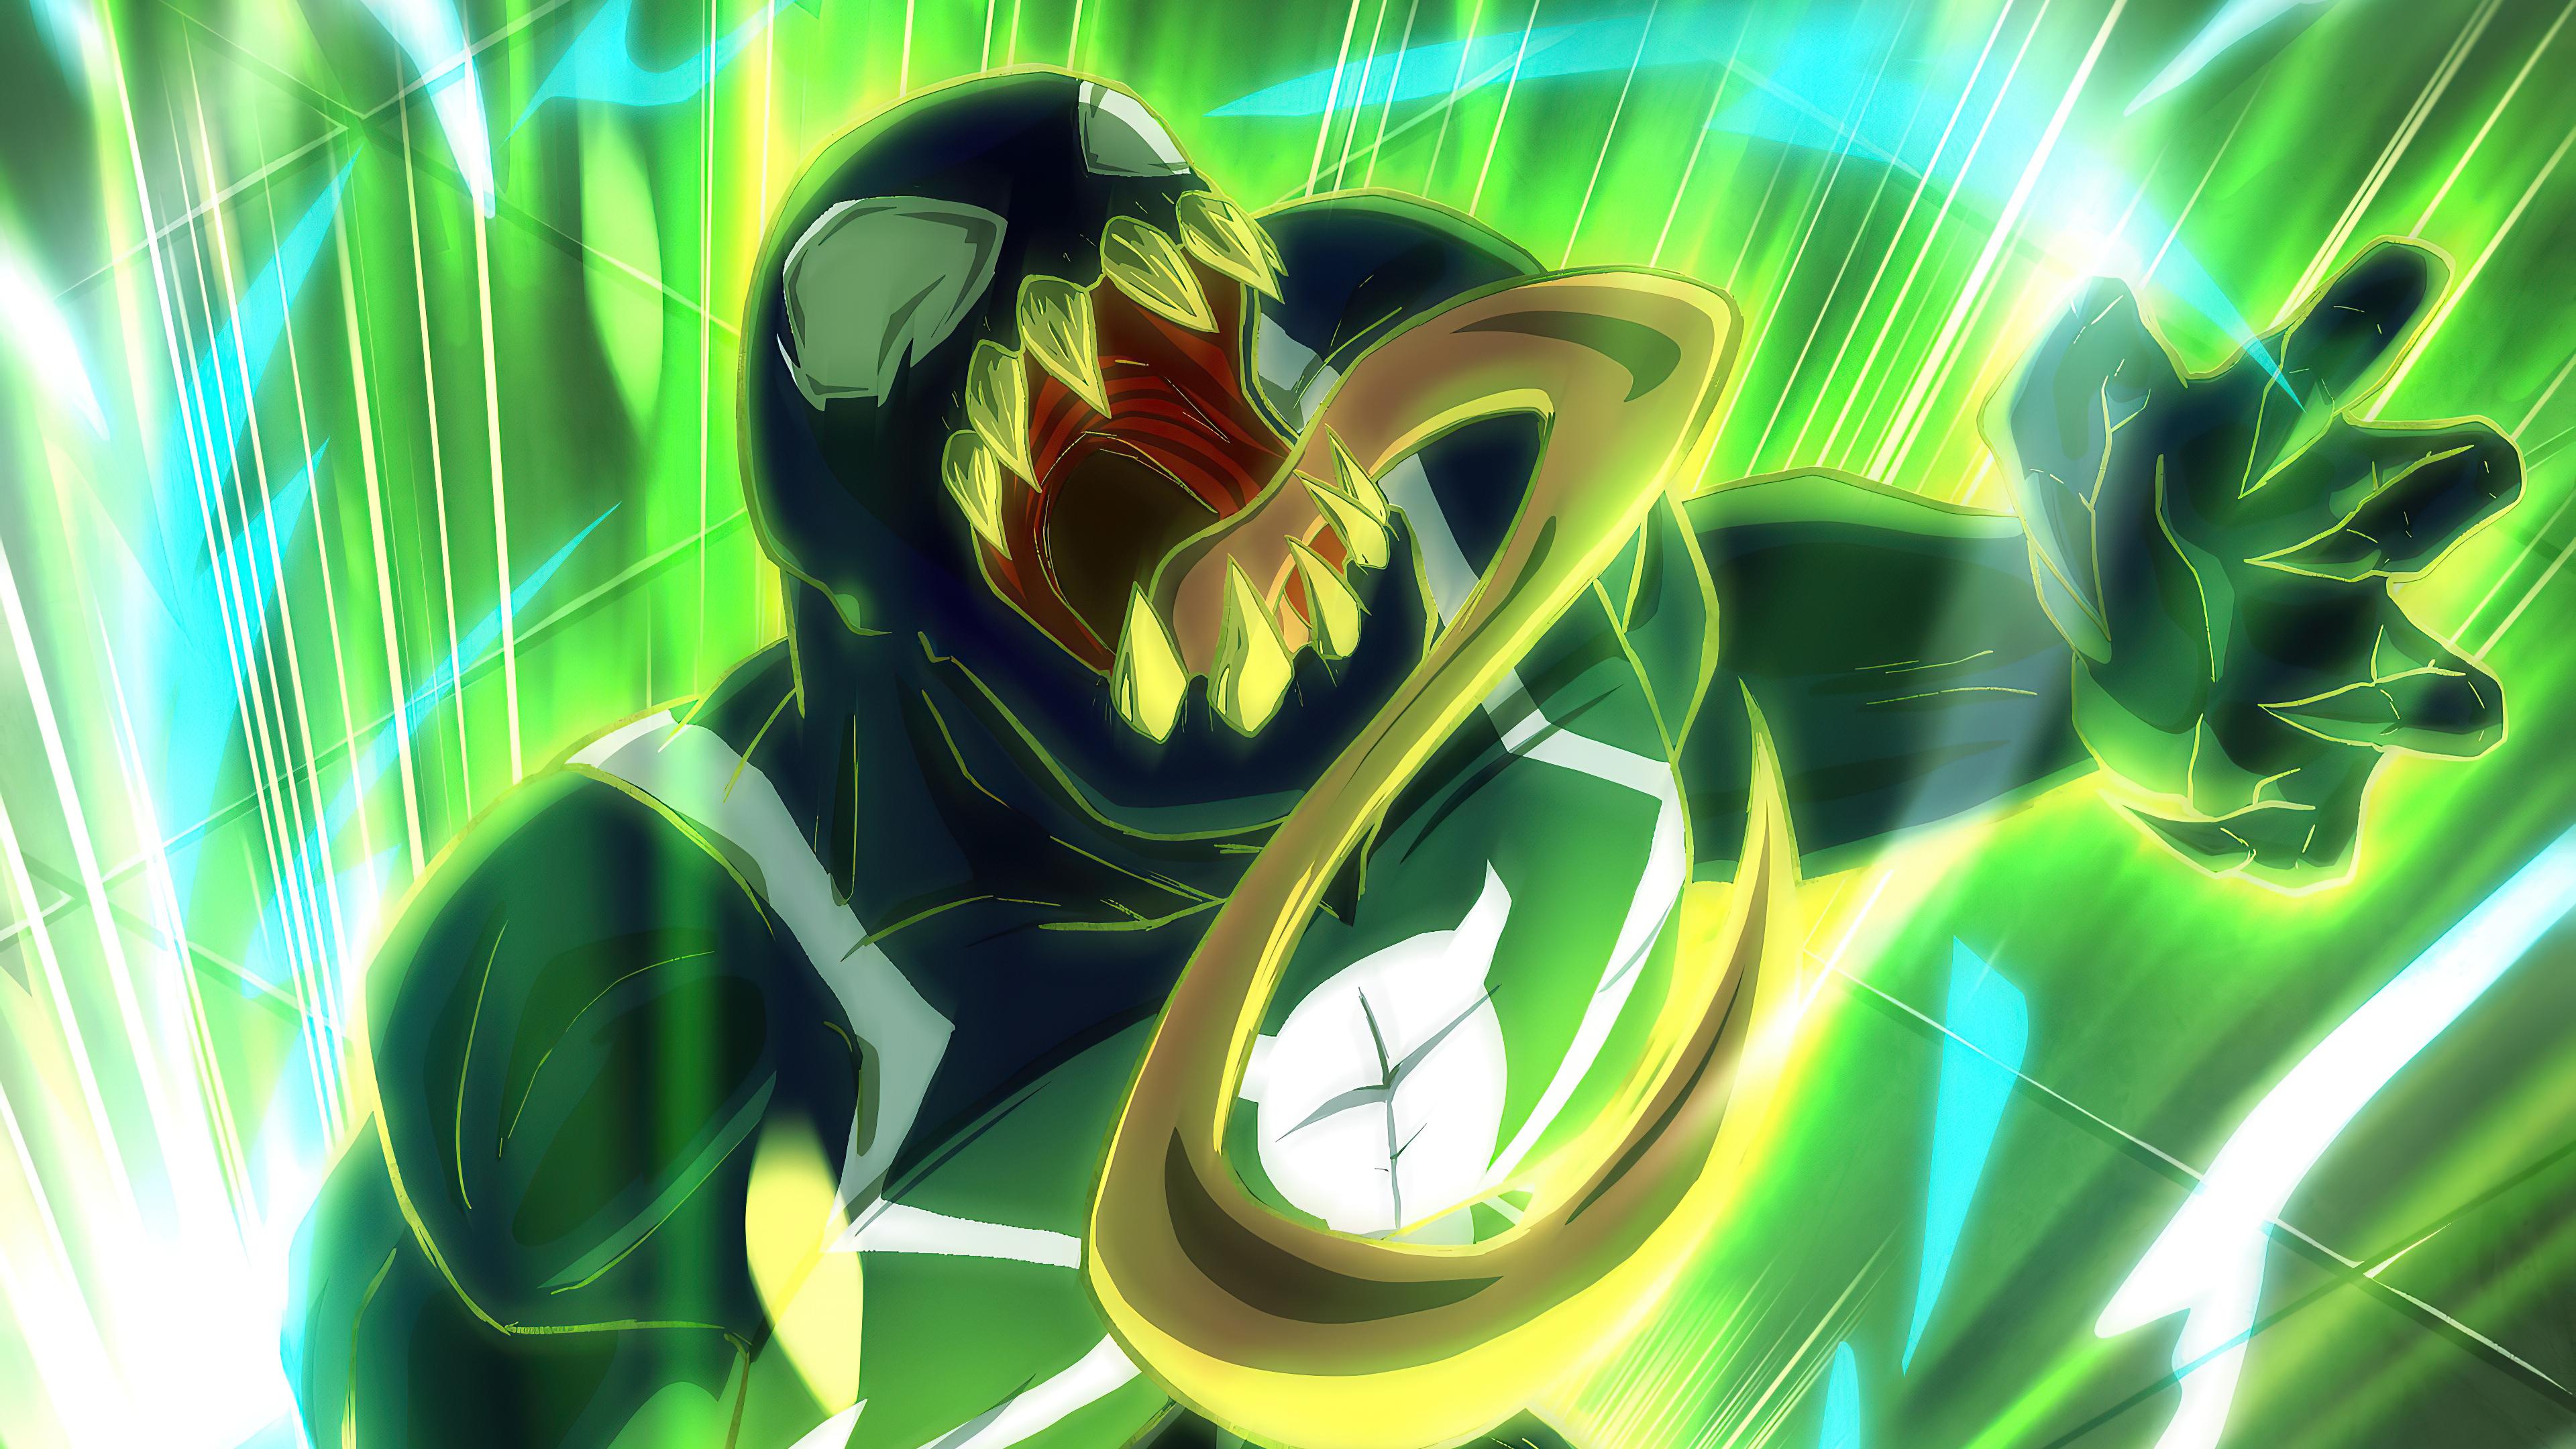 Venom is anger